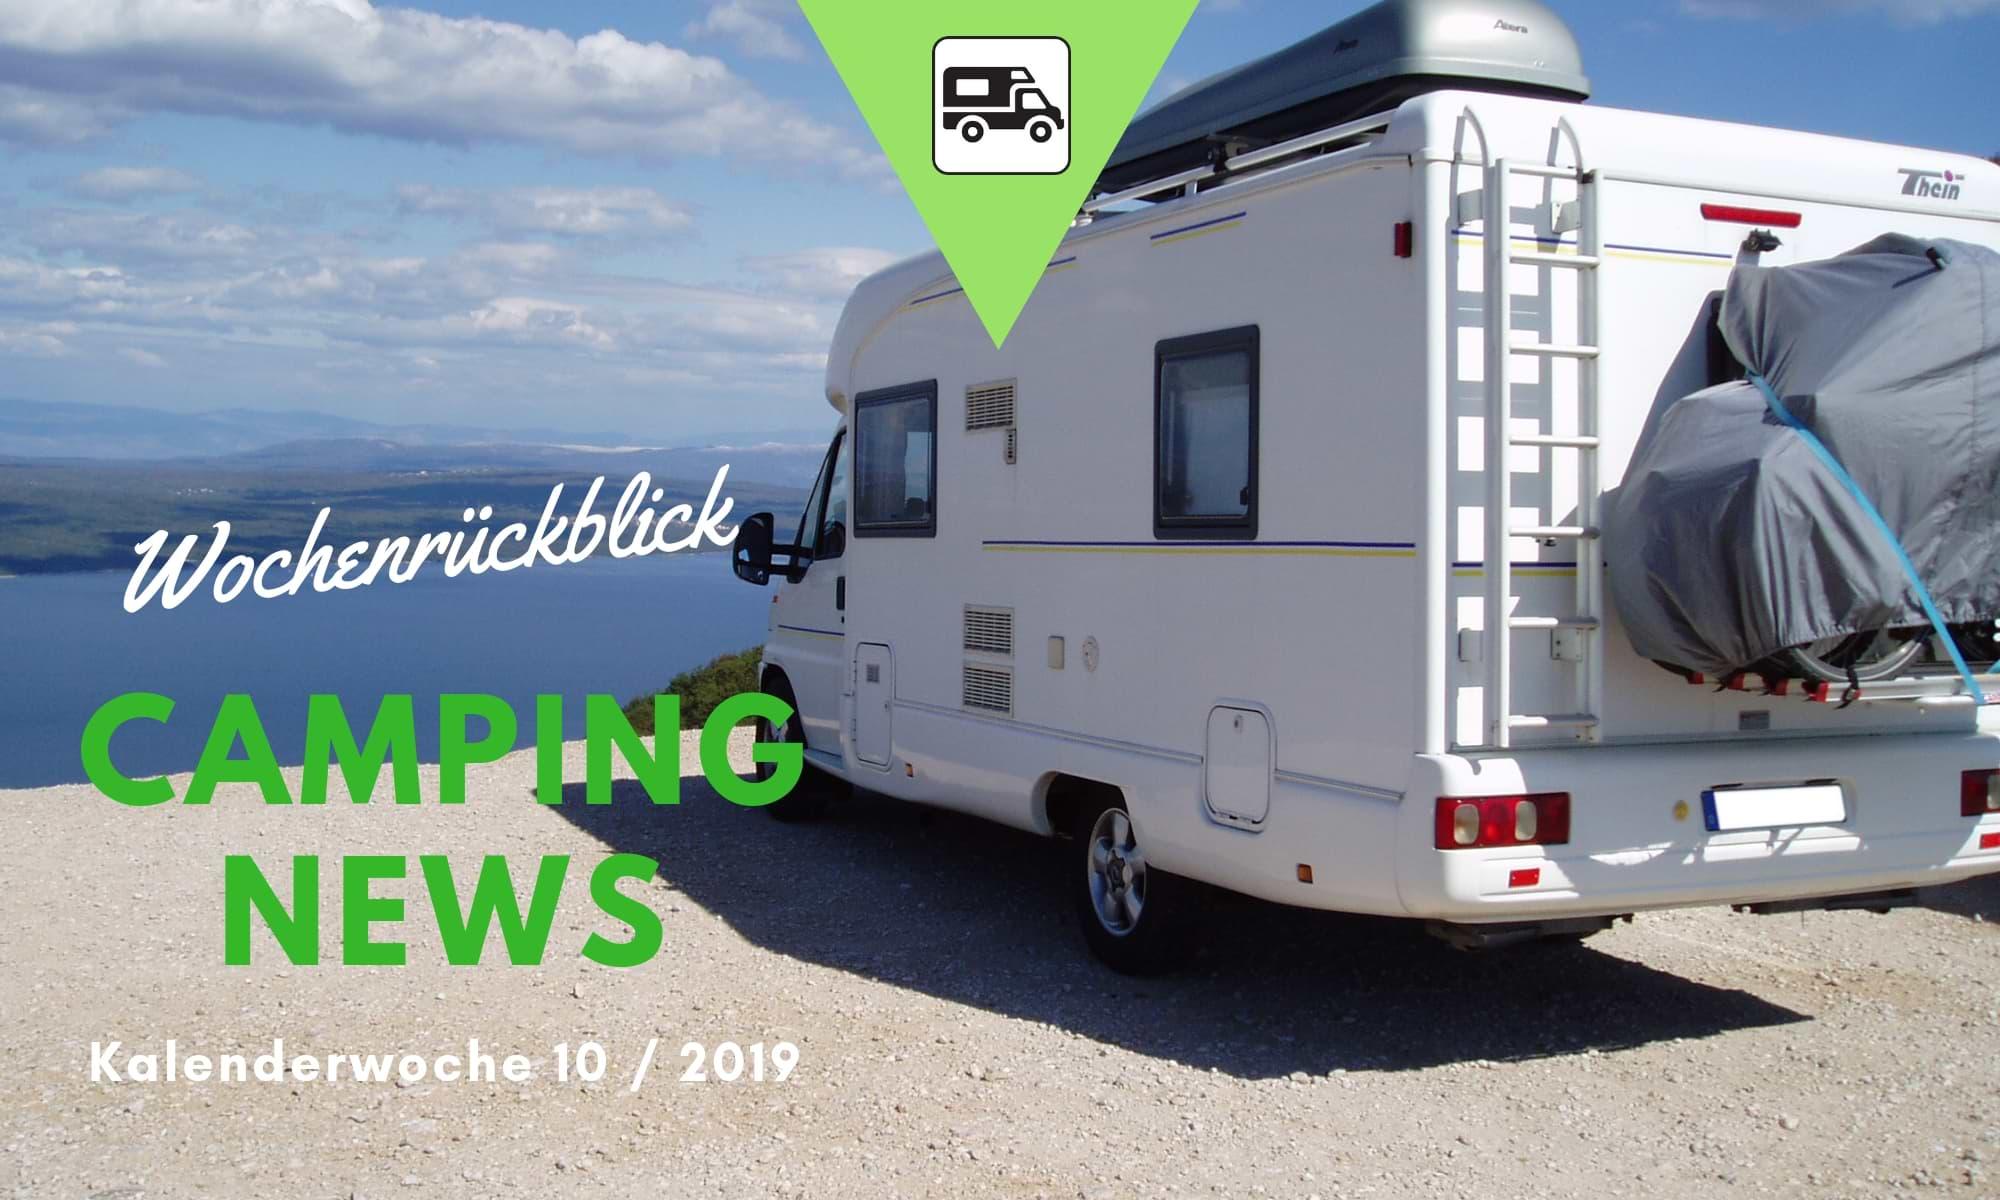 Wochenrückblick Camping News KW10-2019